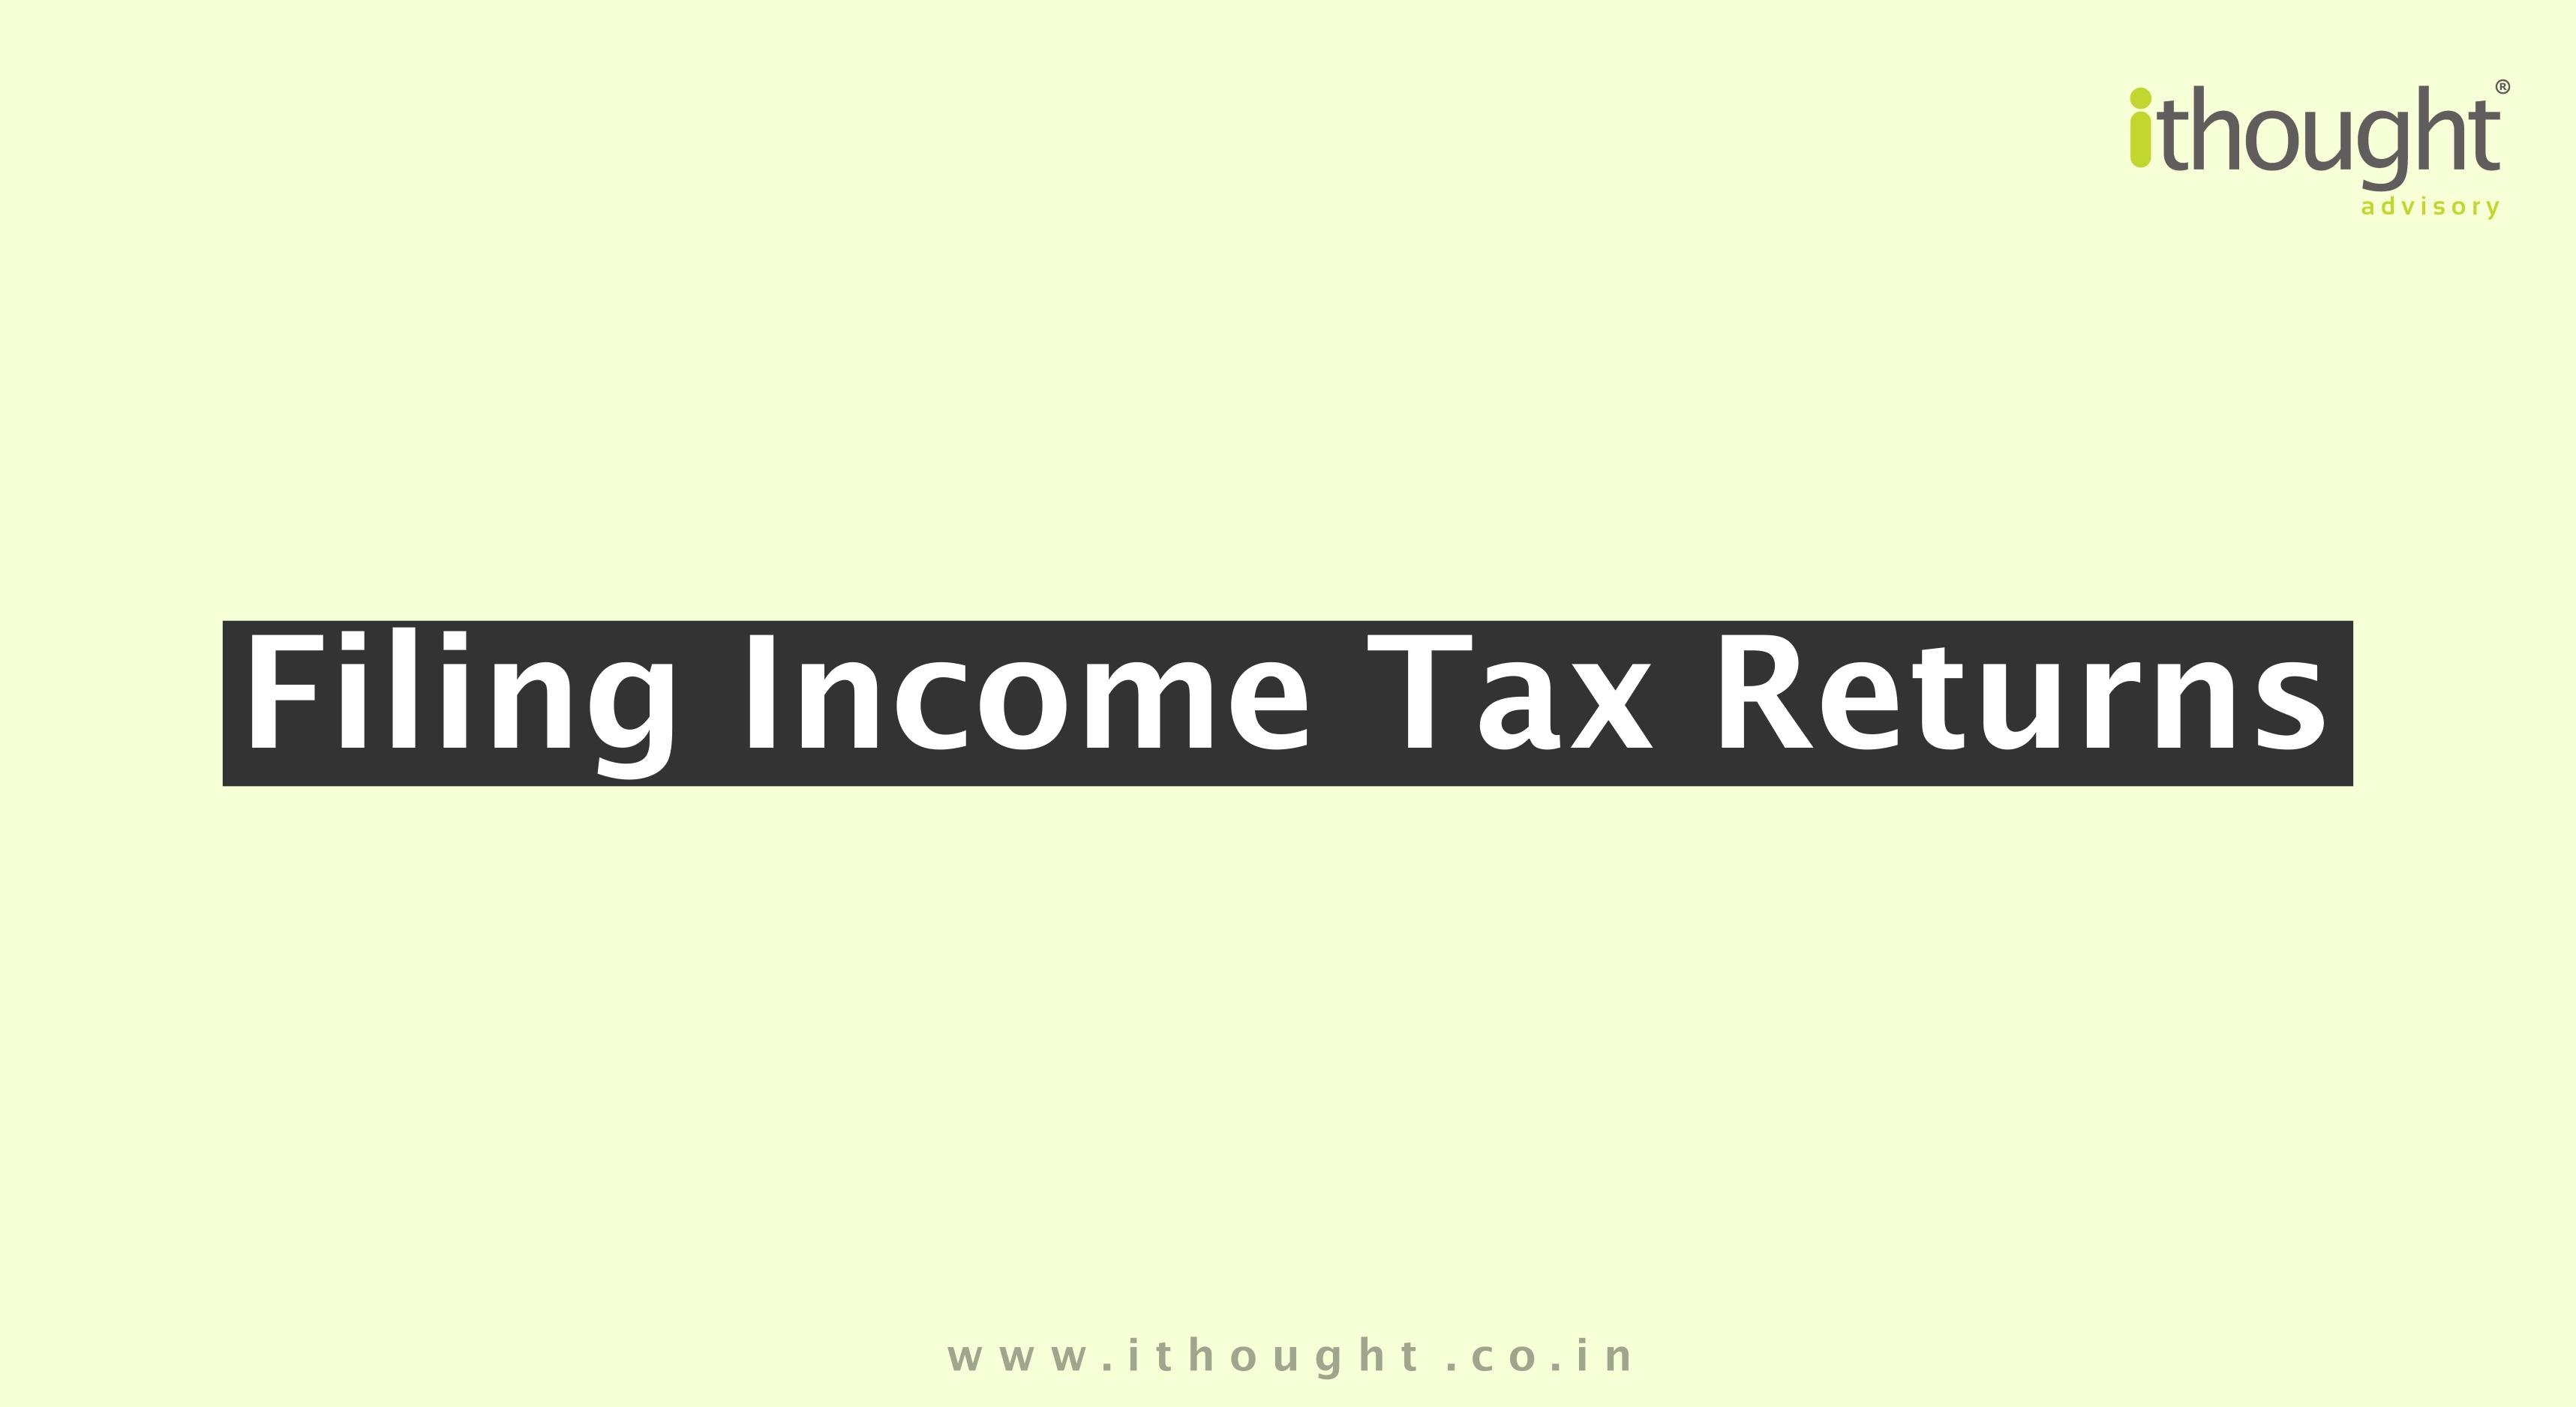 Filing-income-tax-returns